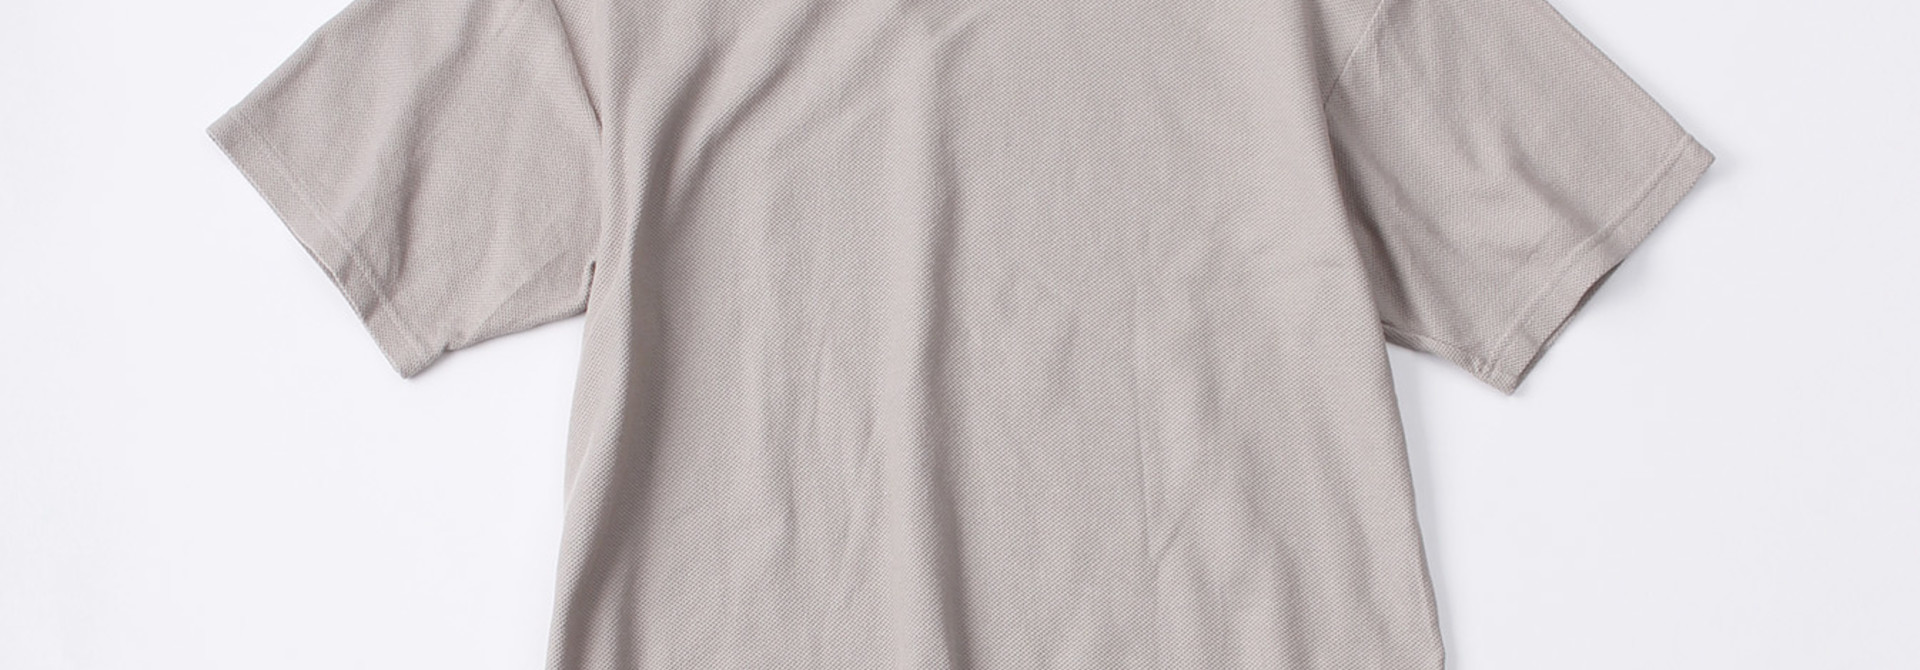 WH Ultimate Pique T-shirt